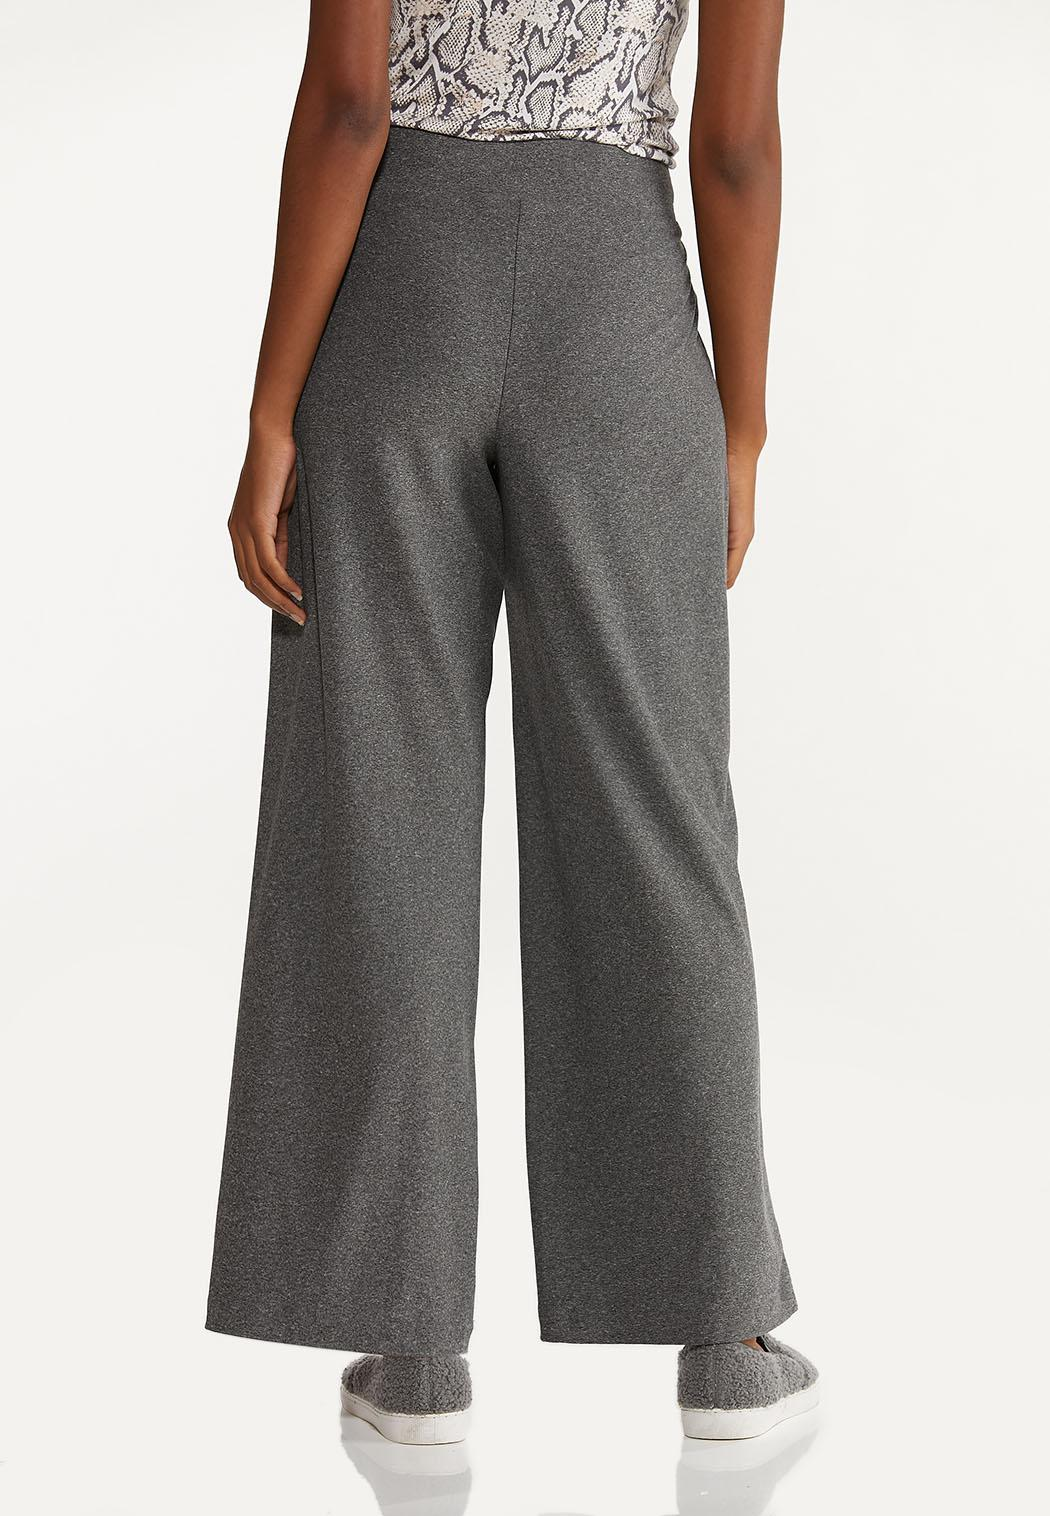 Petite Gray Drawstring Pants (Item #44689249)